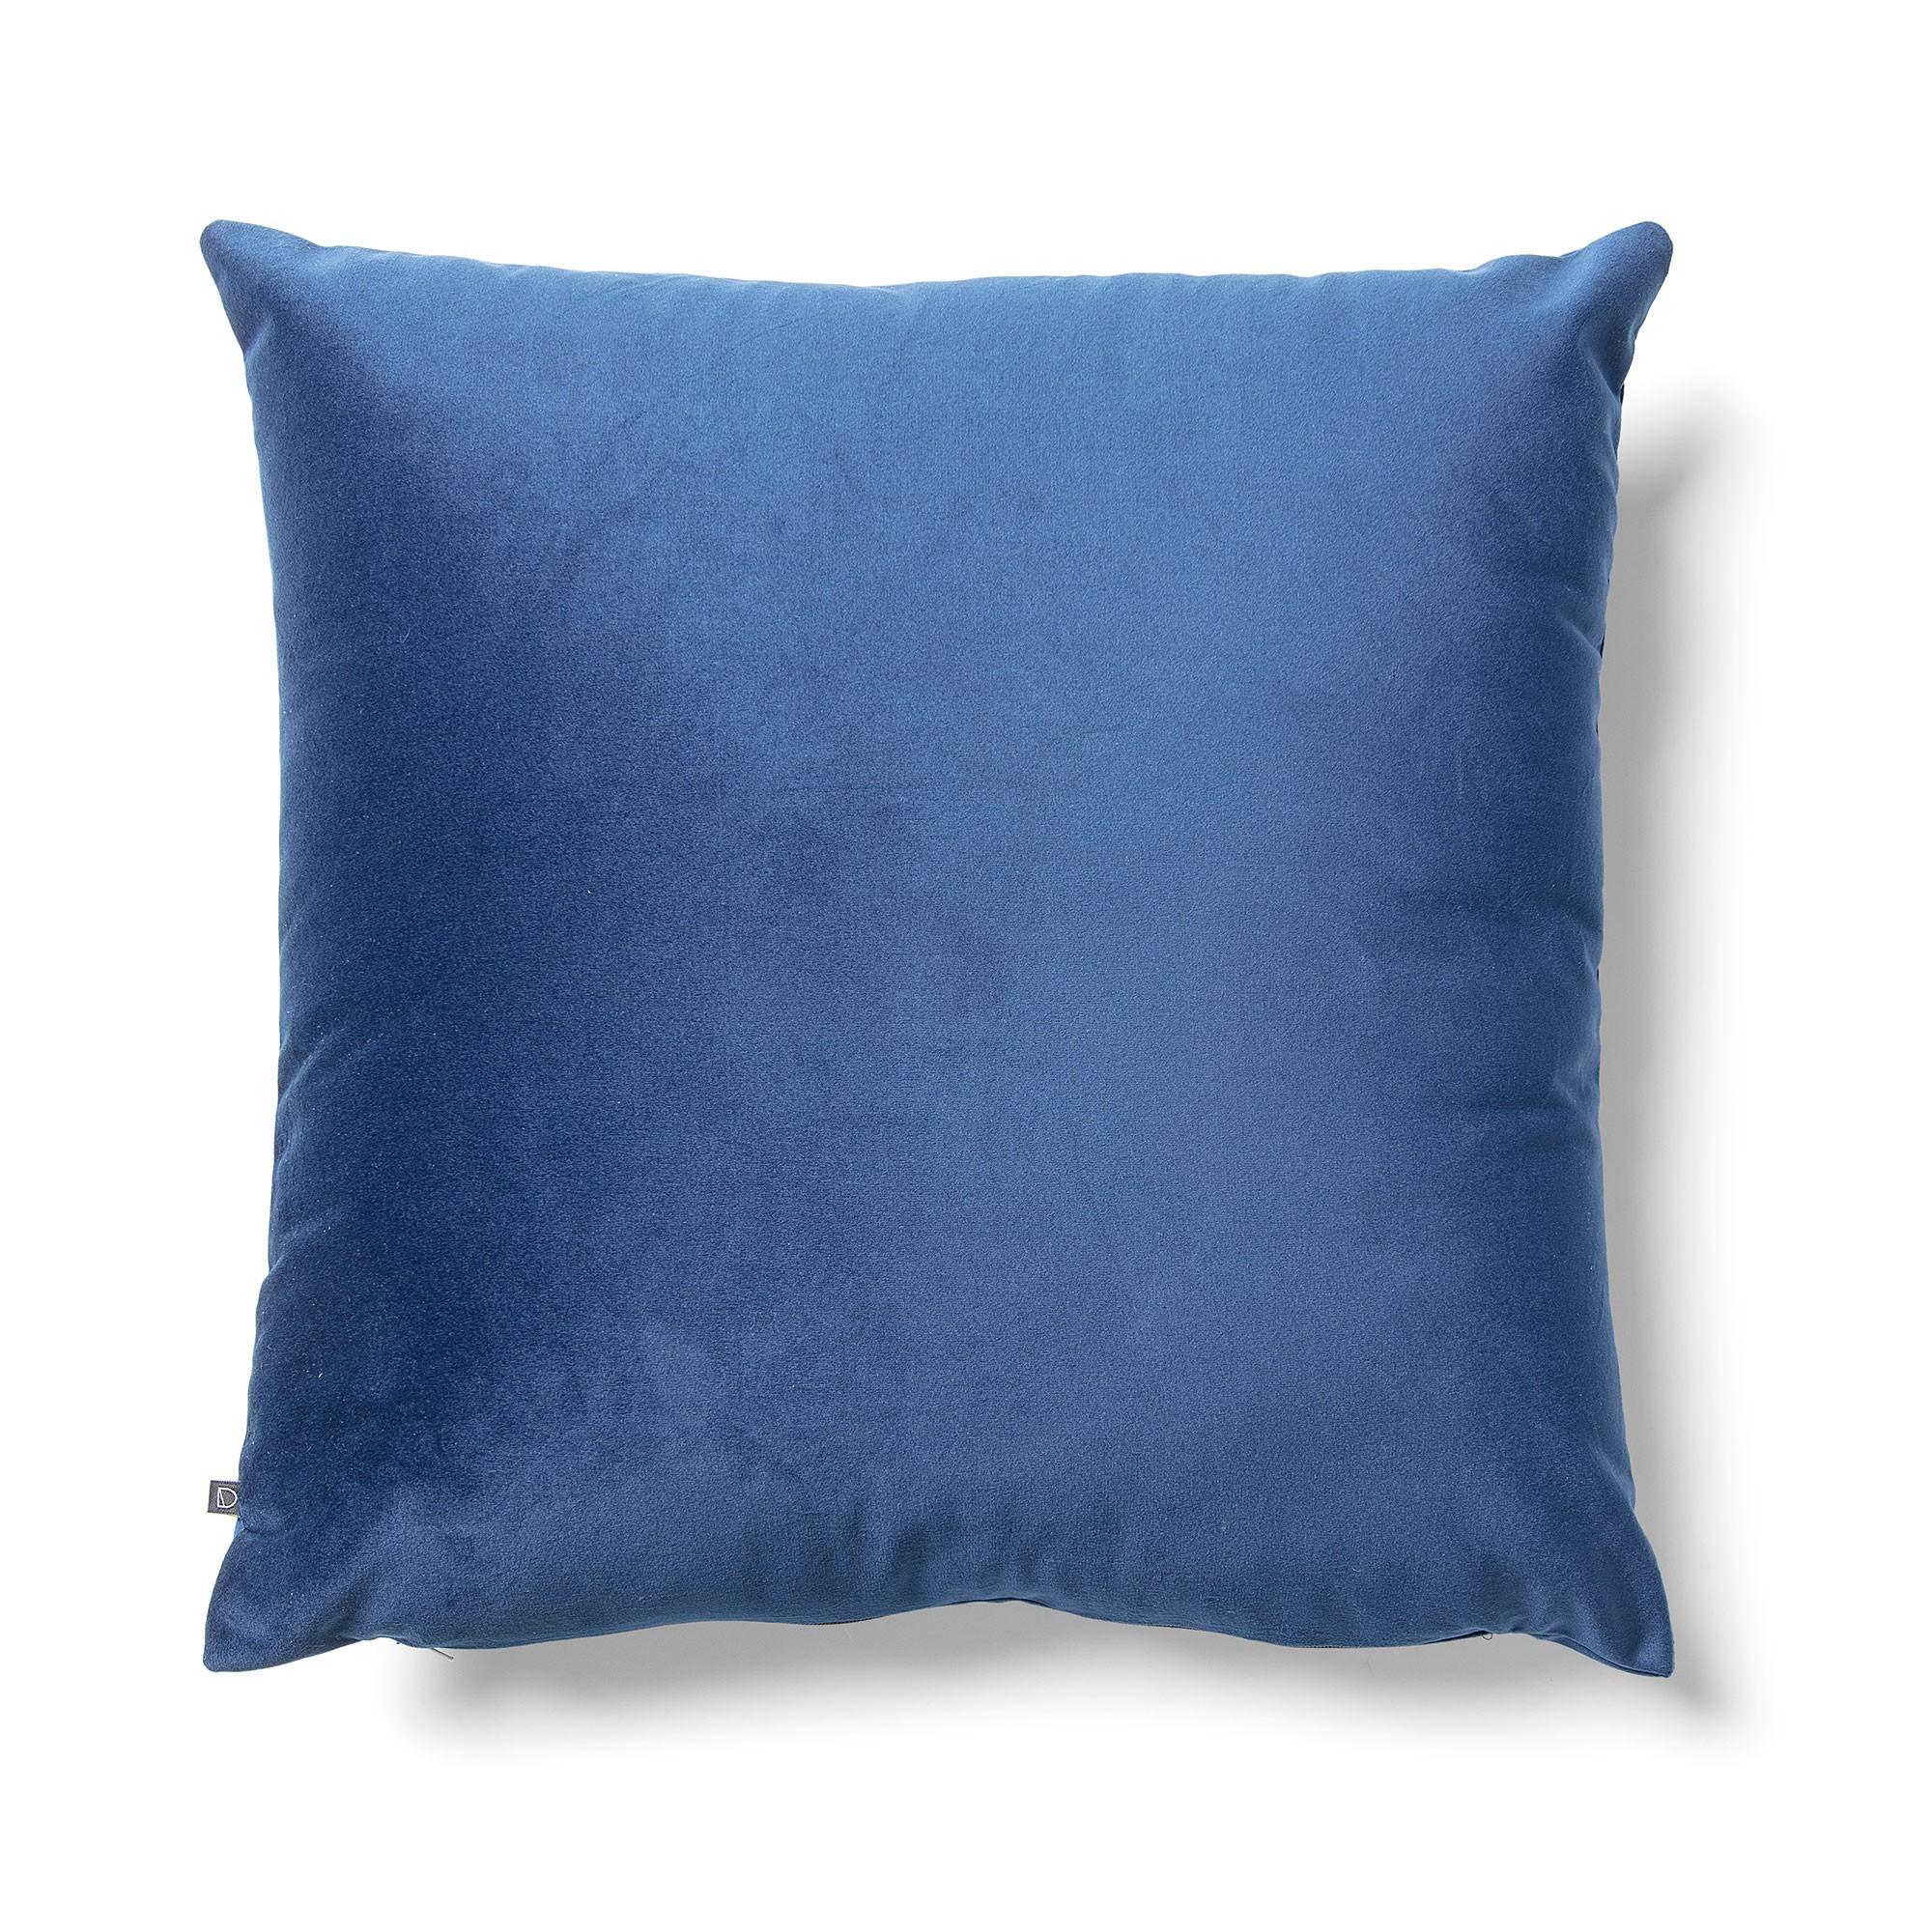 Daraya Velvet Fabric Scatter Cushion, Blue